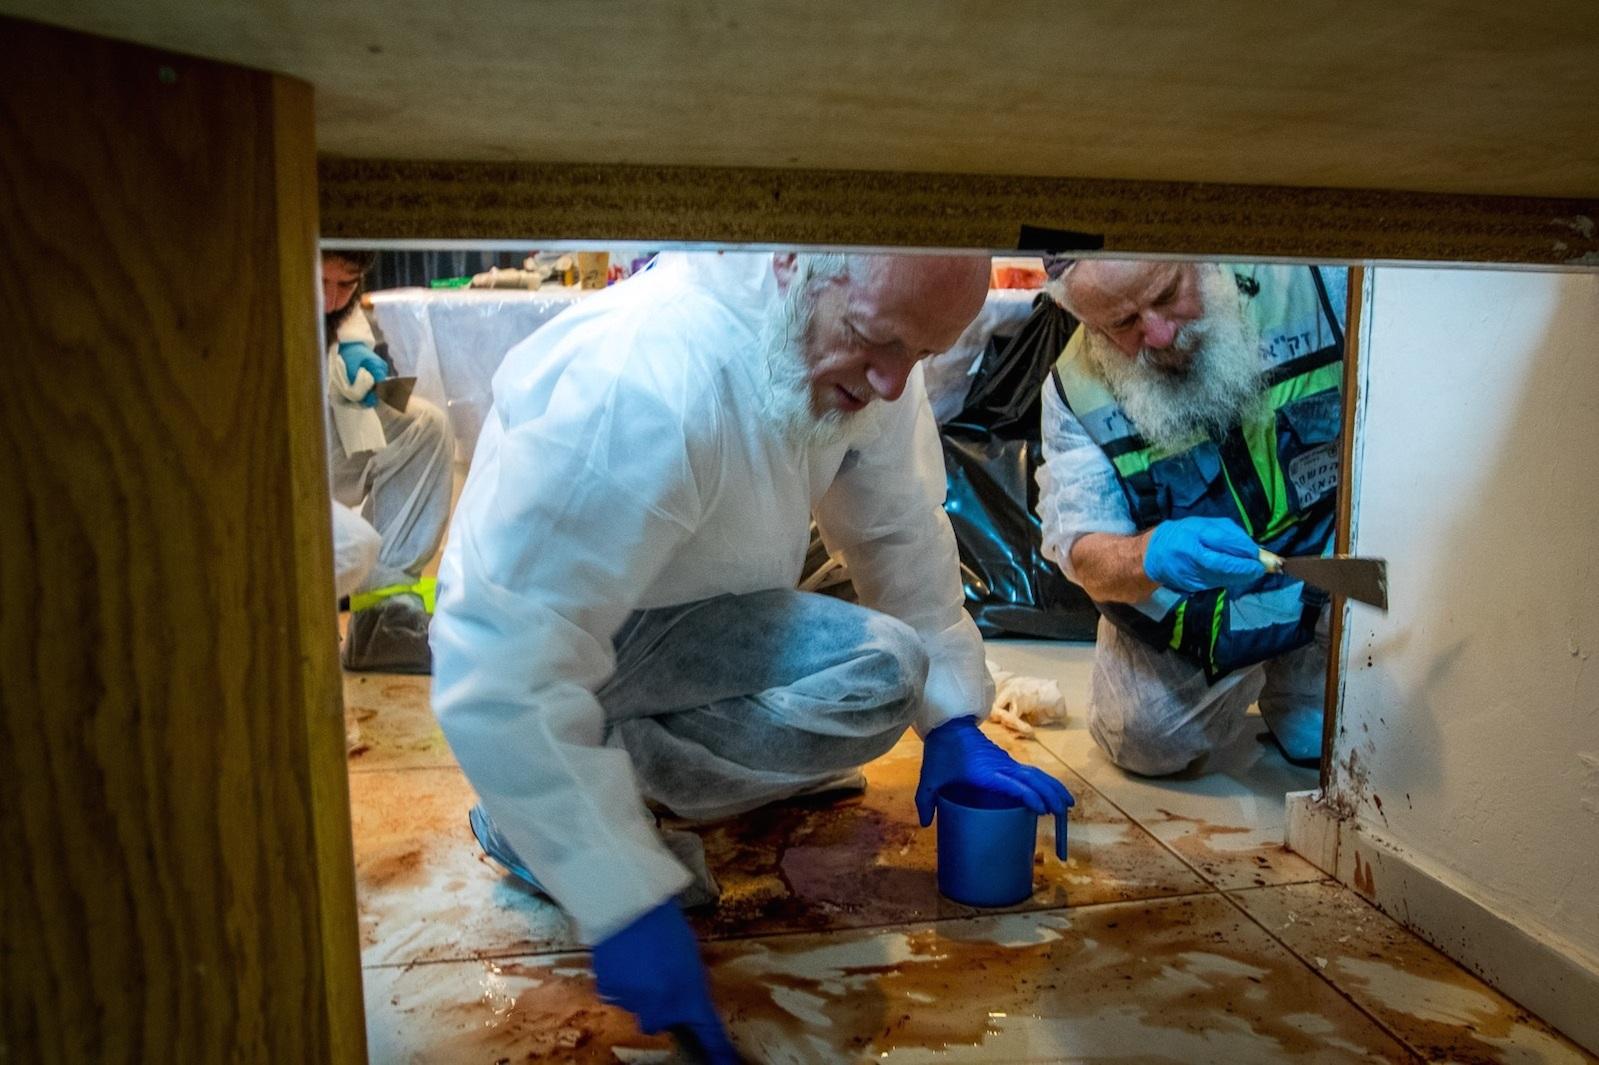 The ZAKA volunteer emergency response group—including its chairman, Yehuda Meshi Zahav (center)—cleans up the scene of Friday night's deadly Palestinian terror attack at the Salomon family home in Halamish. Credit: Yehezkiel Itkin/ZAKA.